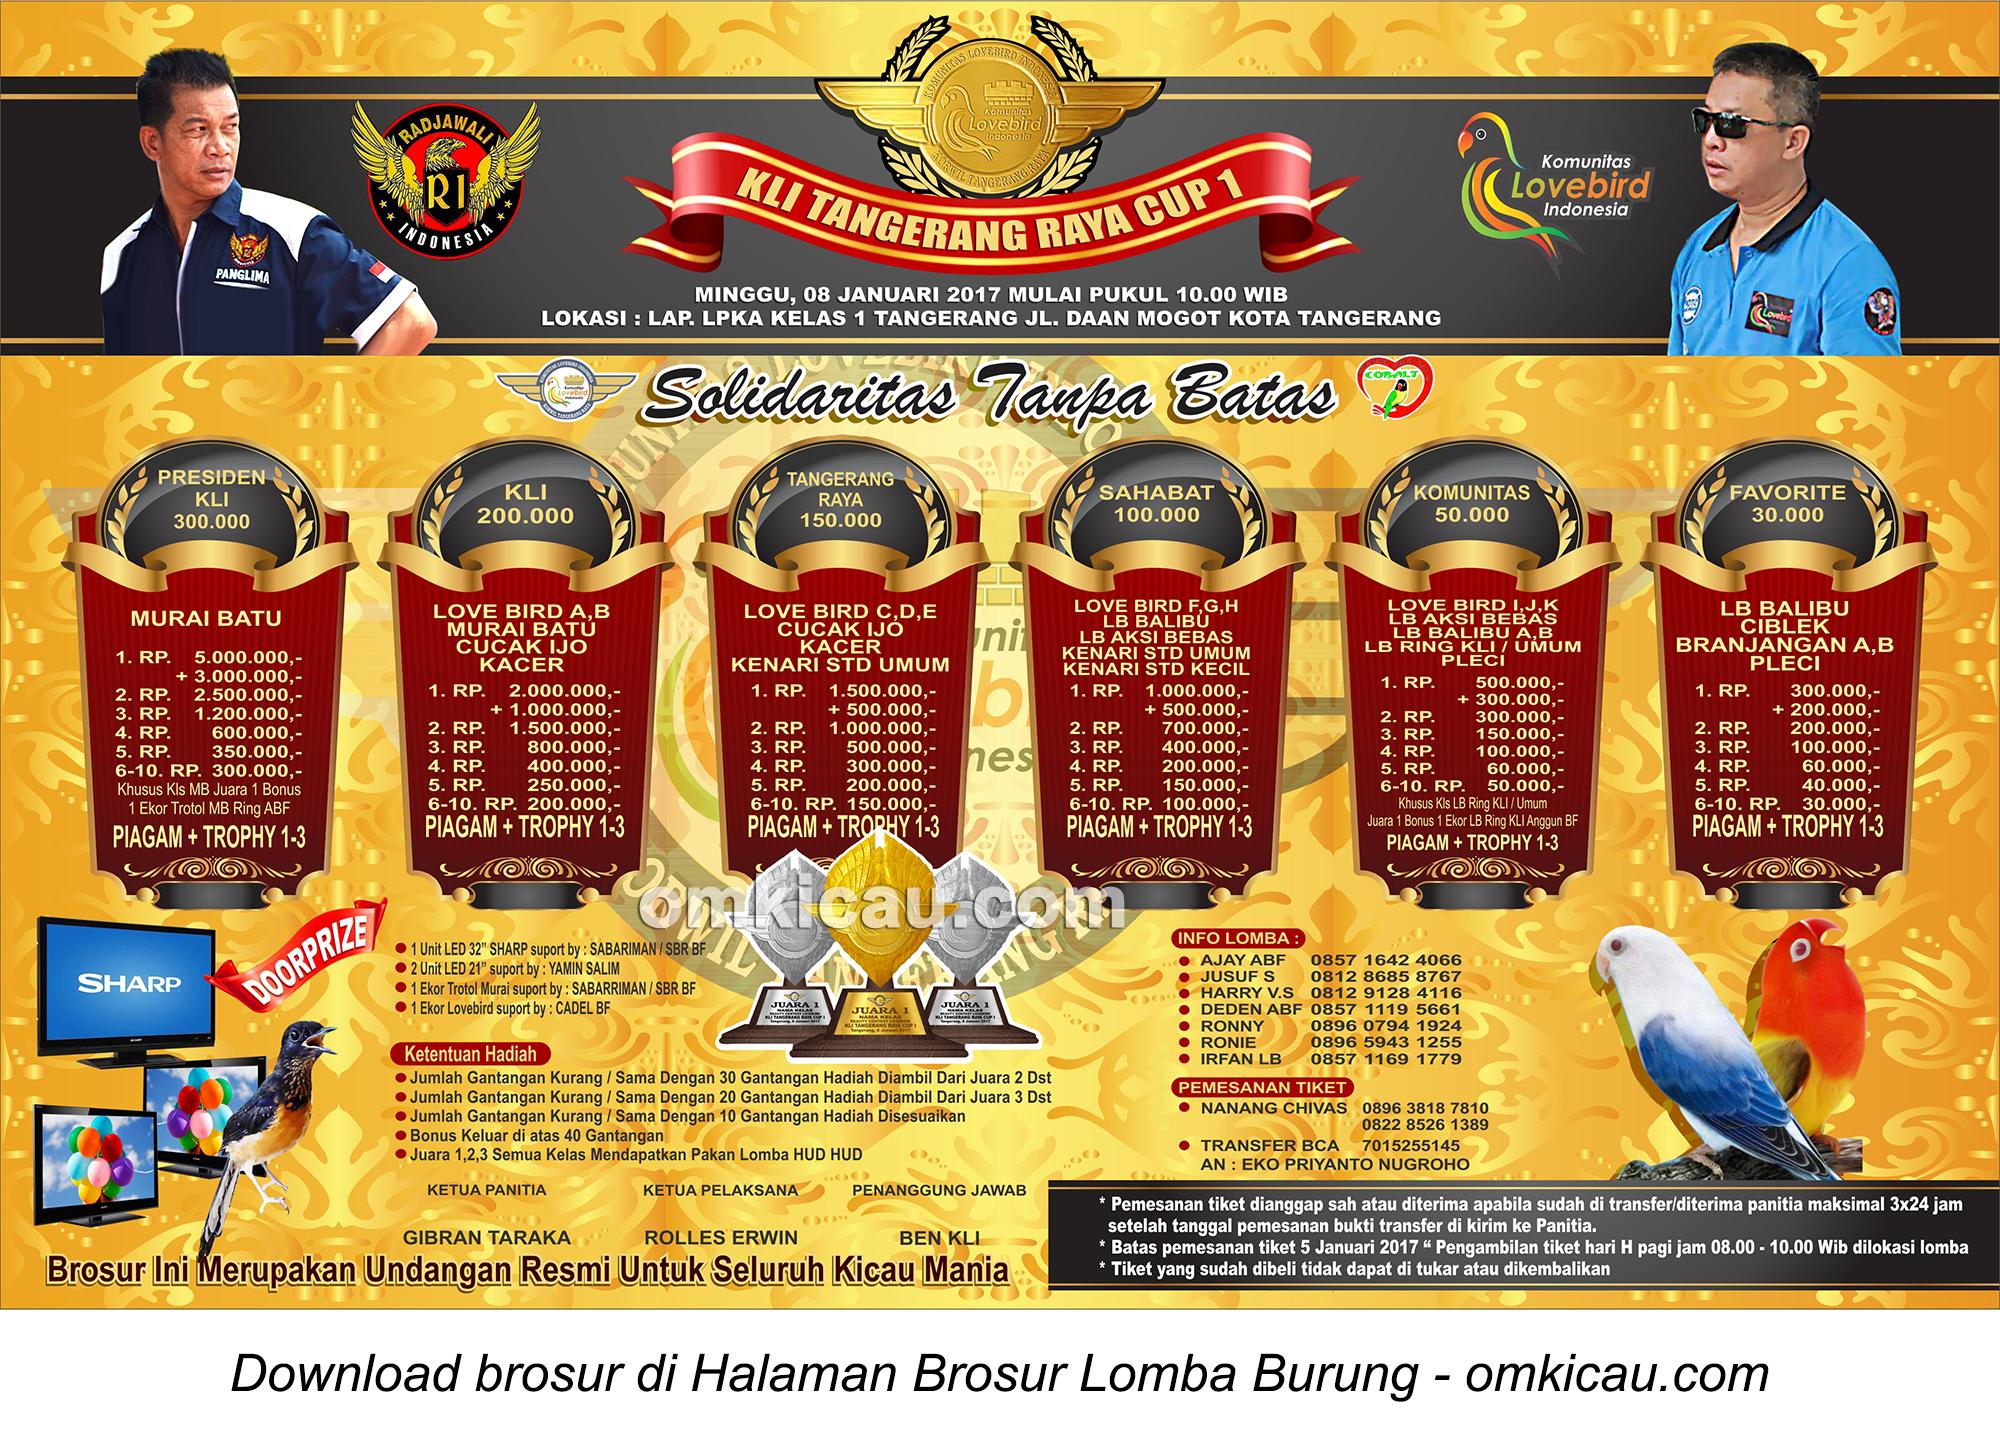 Brosur Lomba Burung Berkicau KLI Tangerang Raya Cup 1, Kota Tangerang, 8 Januari 2017